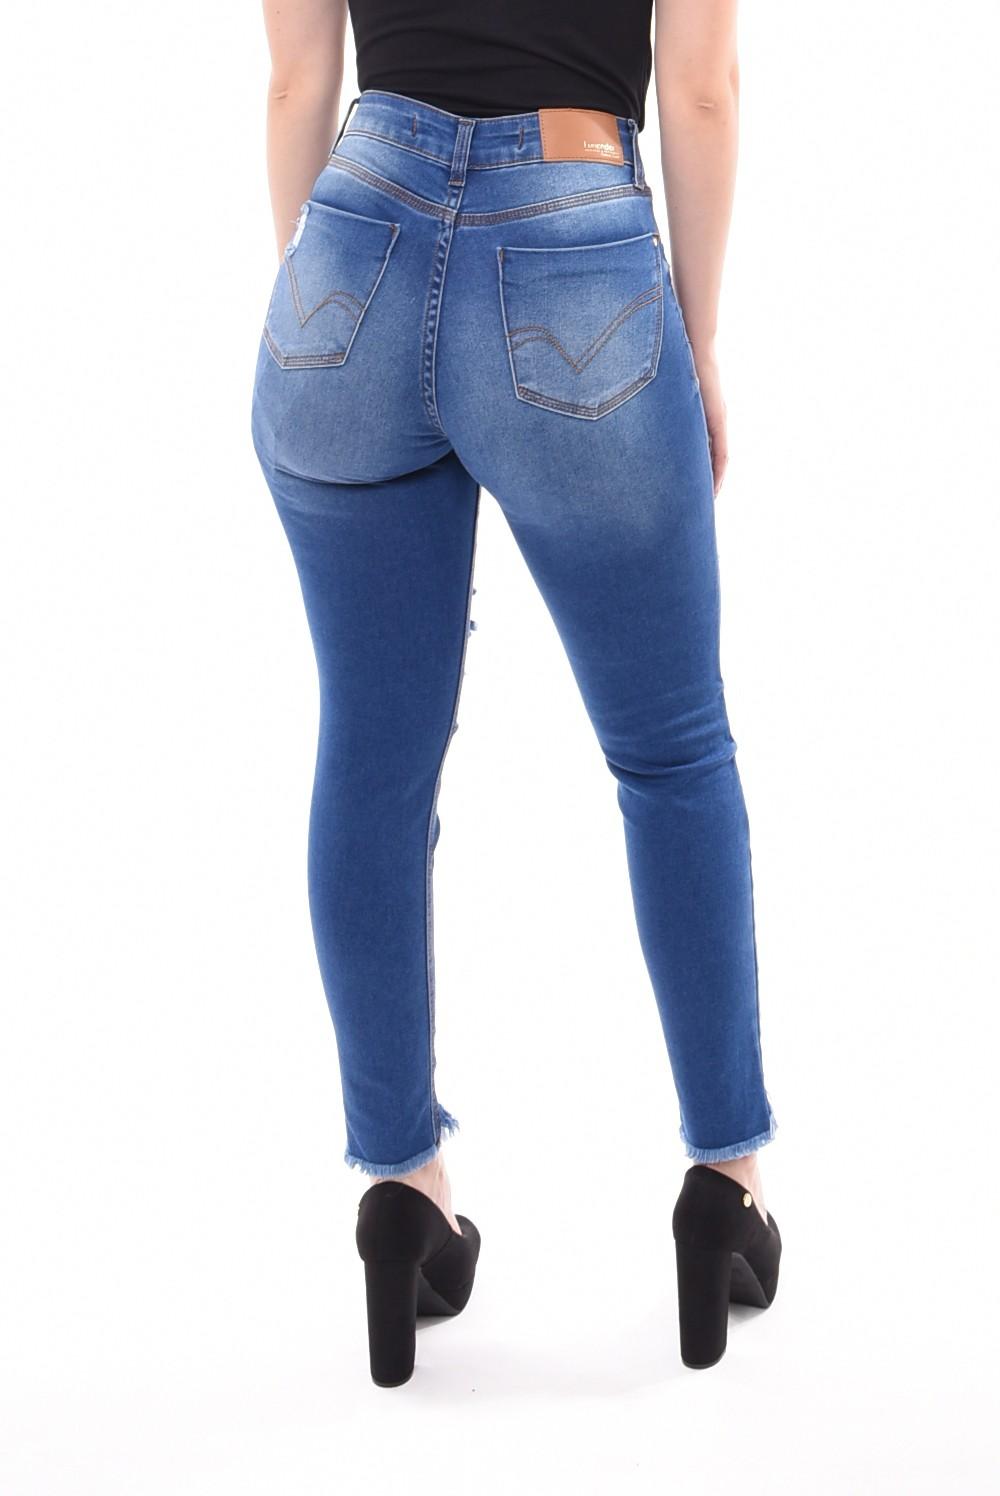 6479b3359c Calça Jeans Lunender Capri Rasgada Chapa Barriga · Calça Jeans Lunender  Capri Rasgada Chapa Barriga